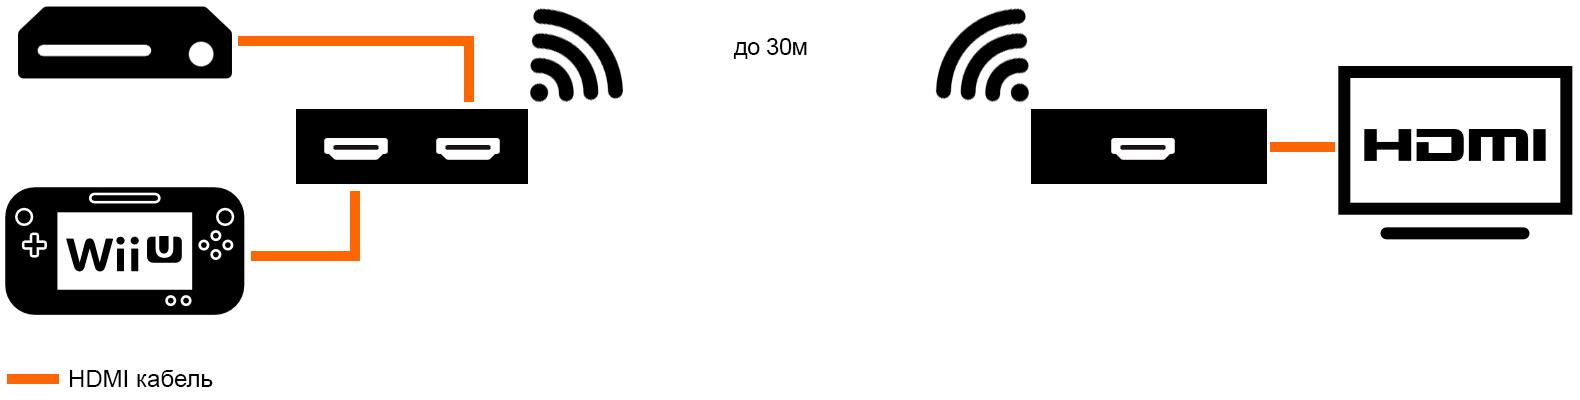 HDMI по воздуху